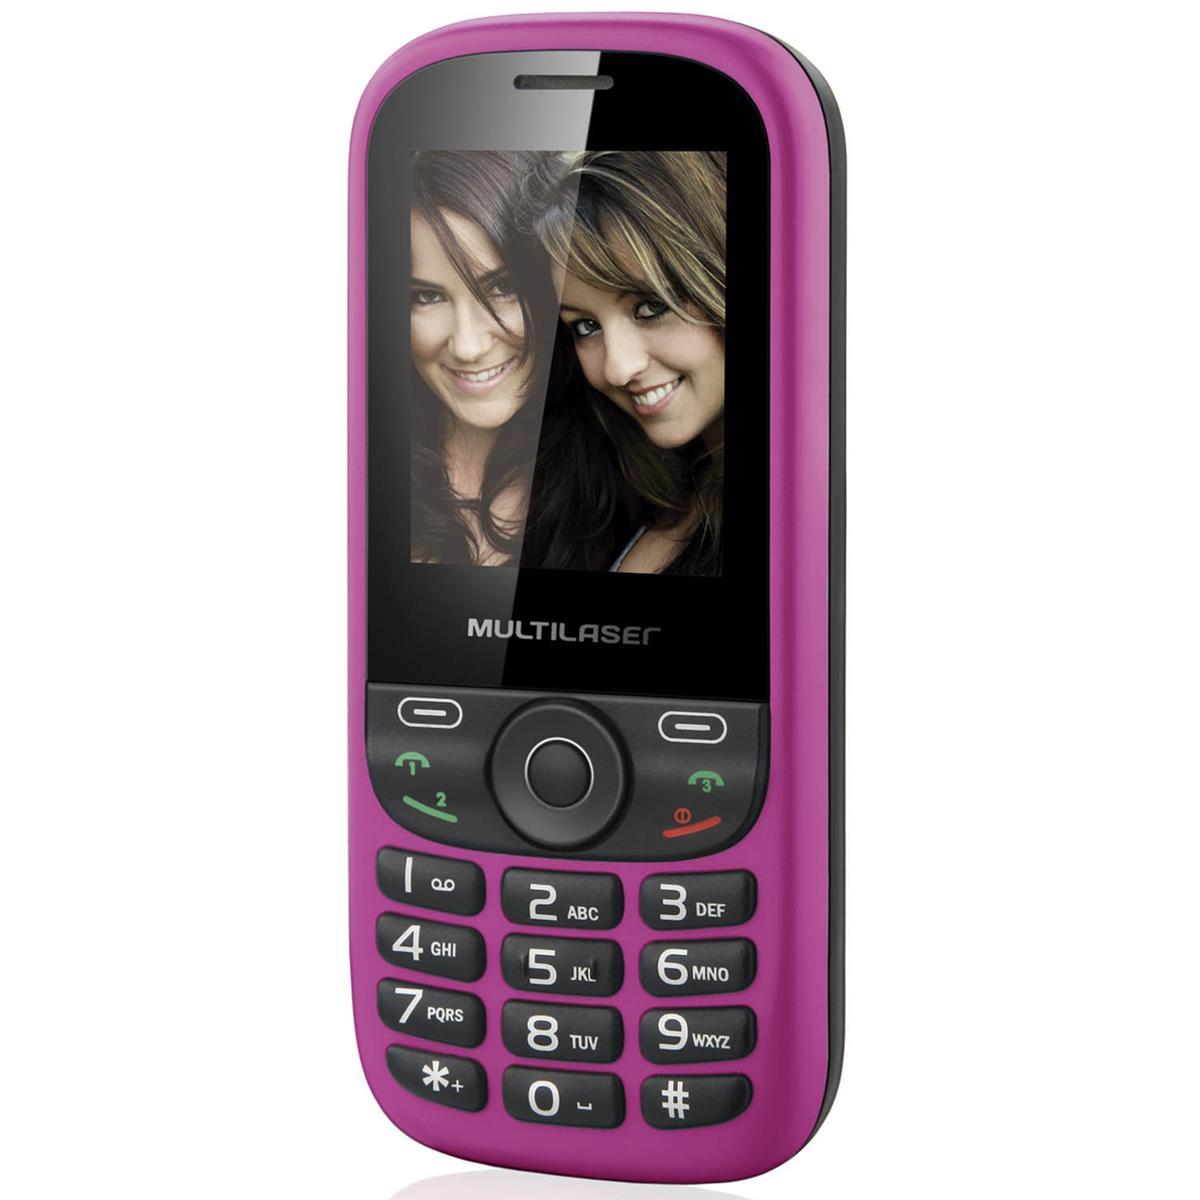 Telefone Celular Up 3 Chip Preto E Rosa P3275 Multilaser